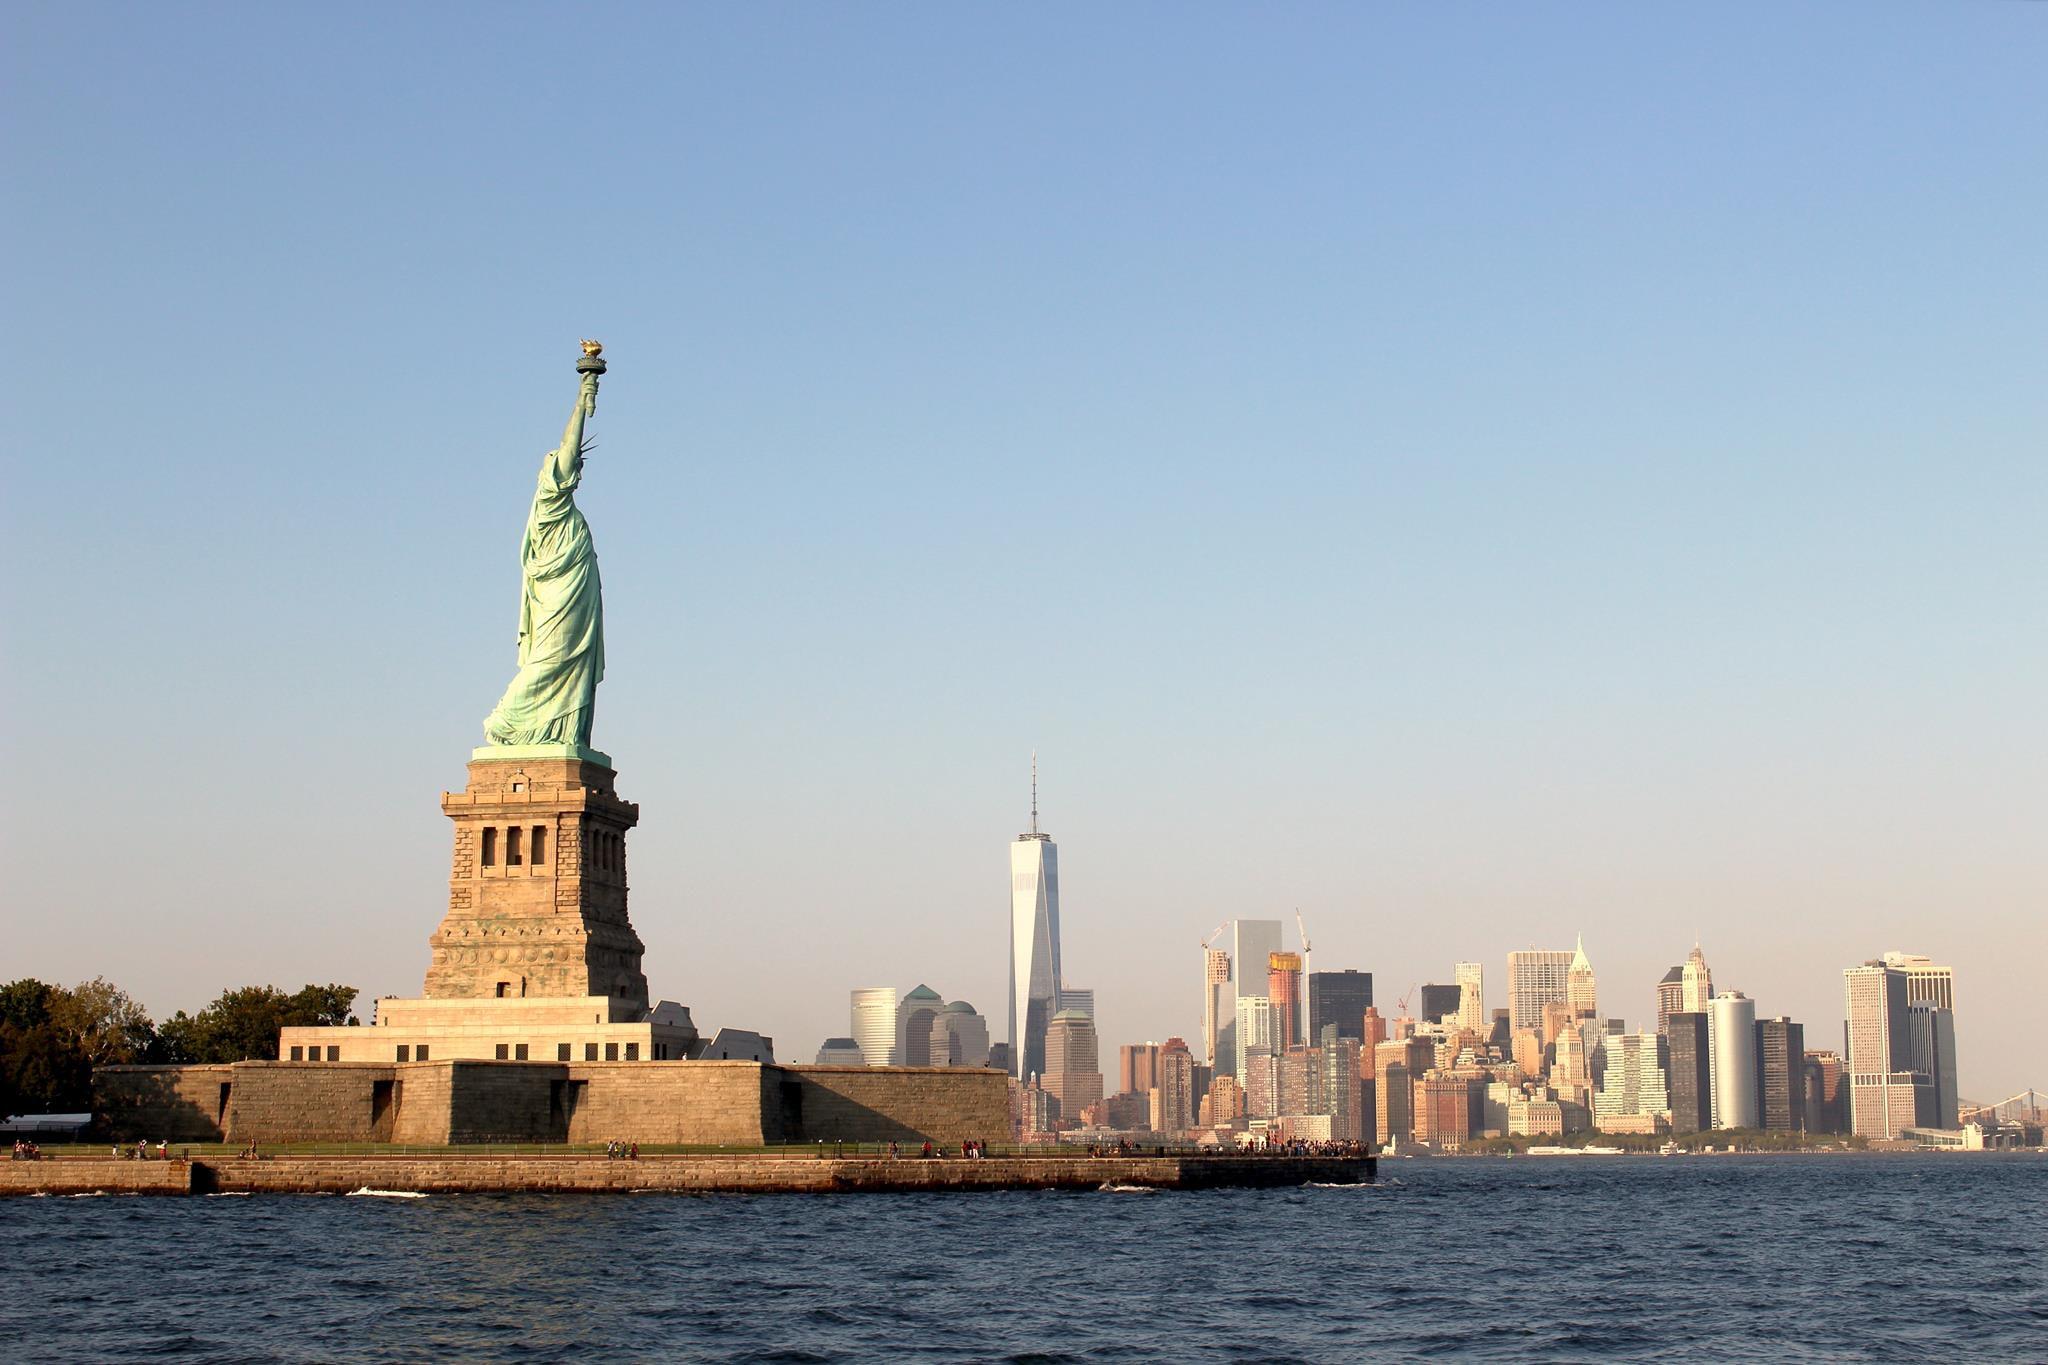 statue of liberty, new york skyline view